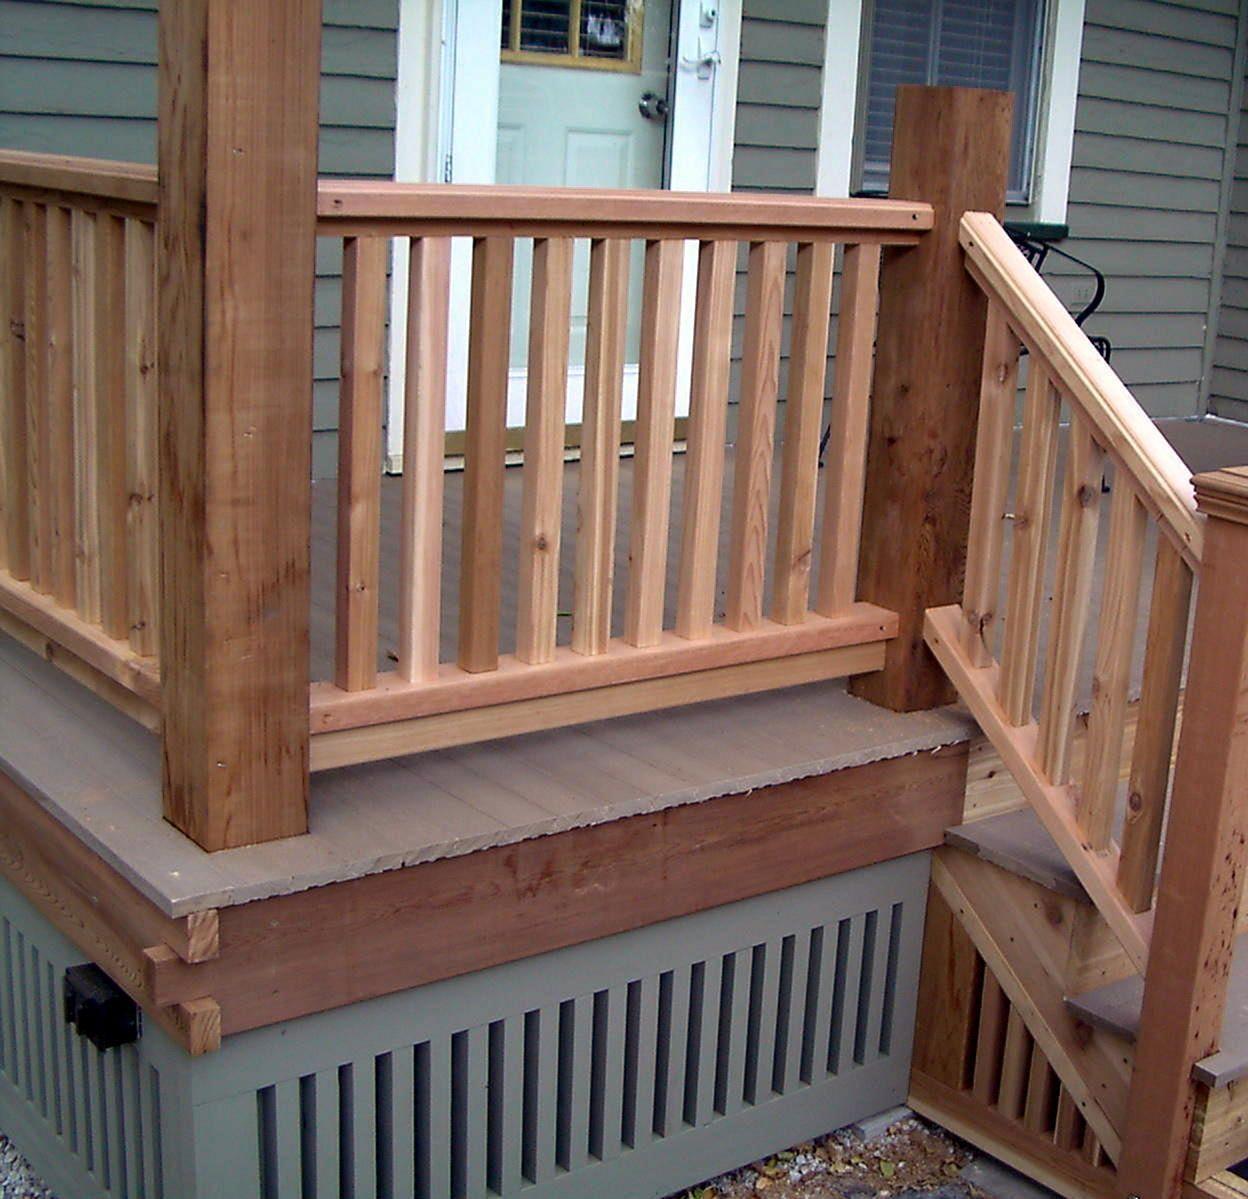 10 Beautiful Deck Railing Ideas To Inspire Your Home Porch Decoredo Patio Railing Porch Railing Designs Deck Railing Design